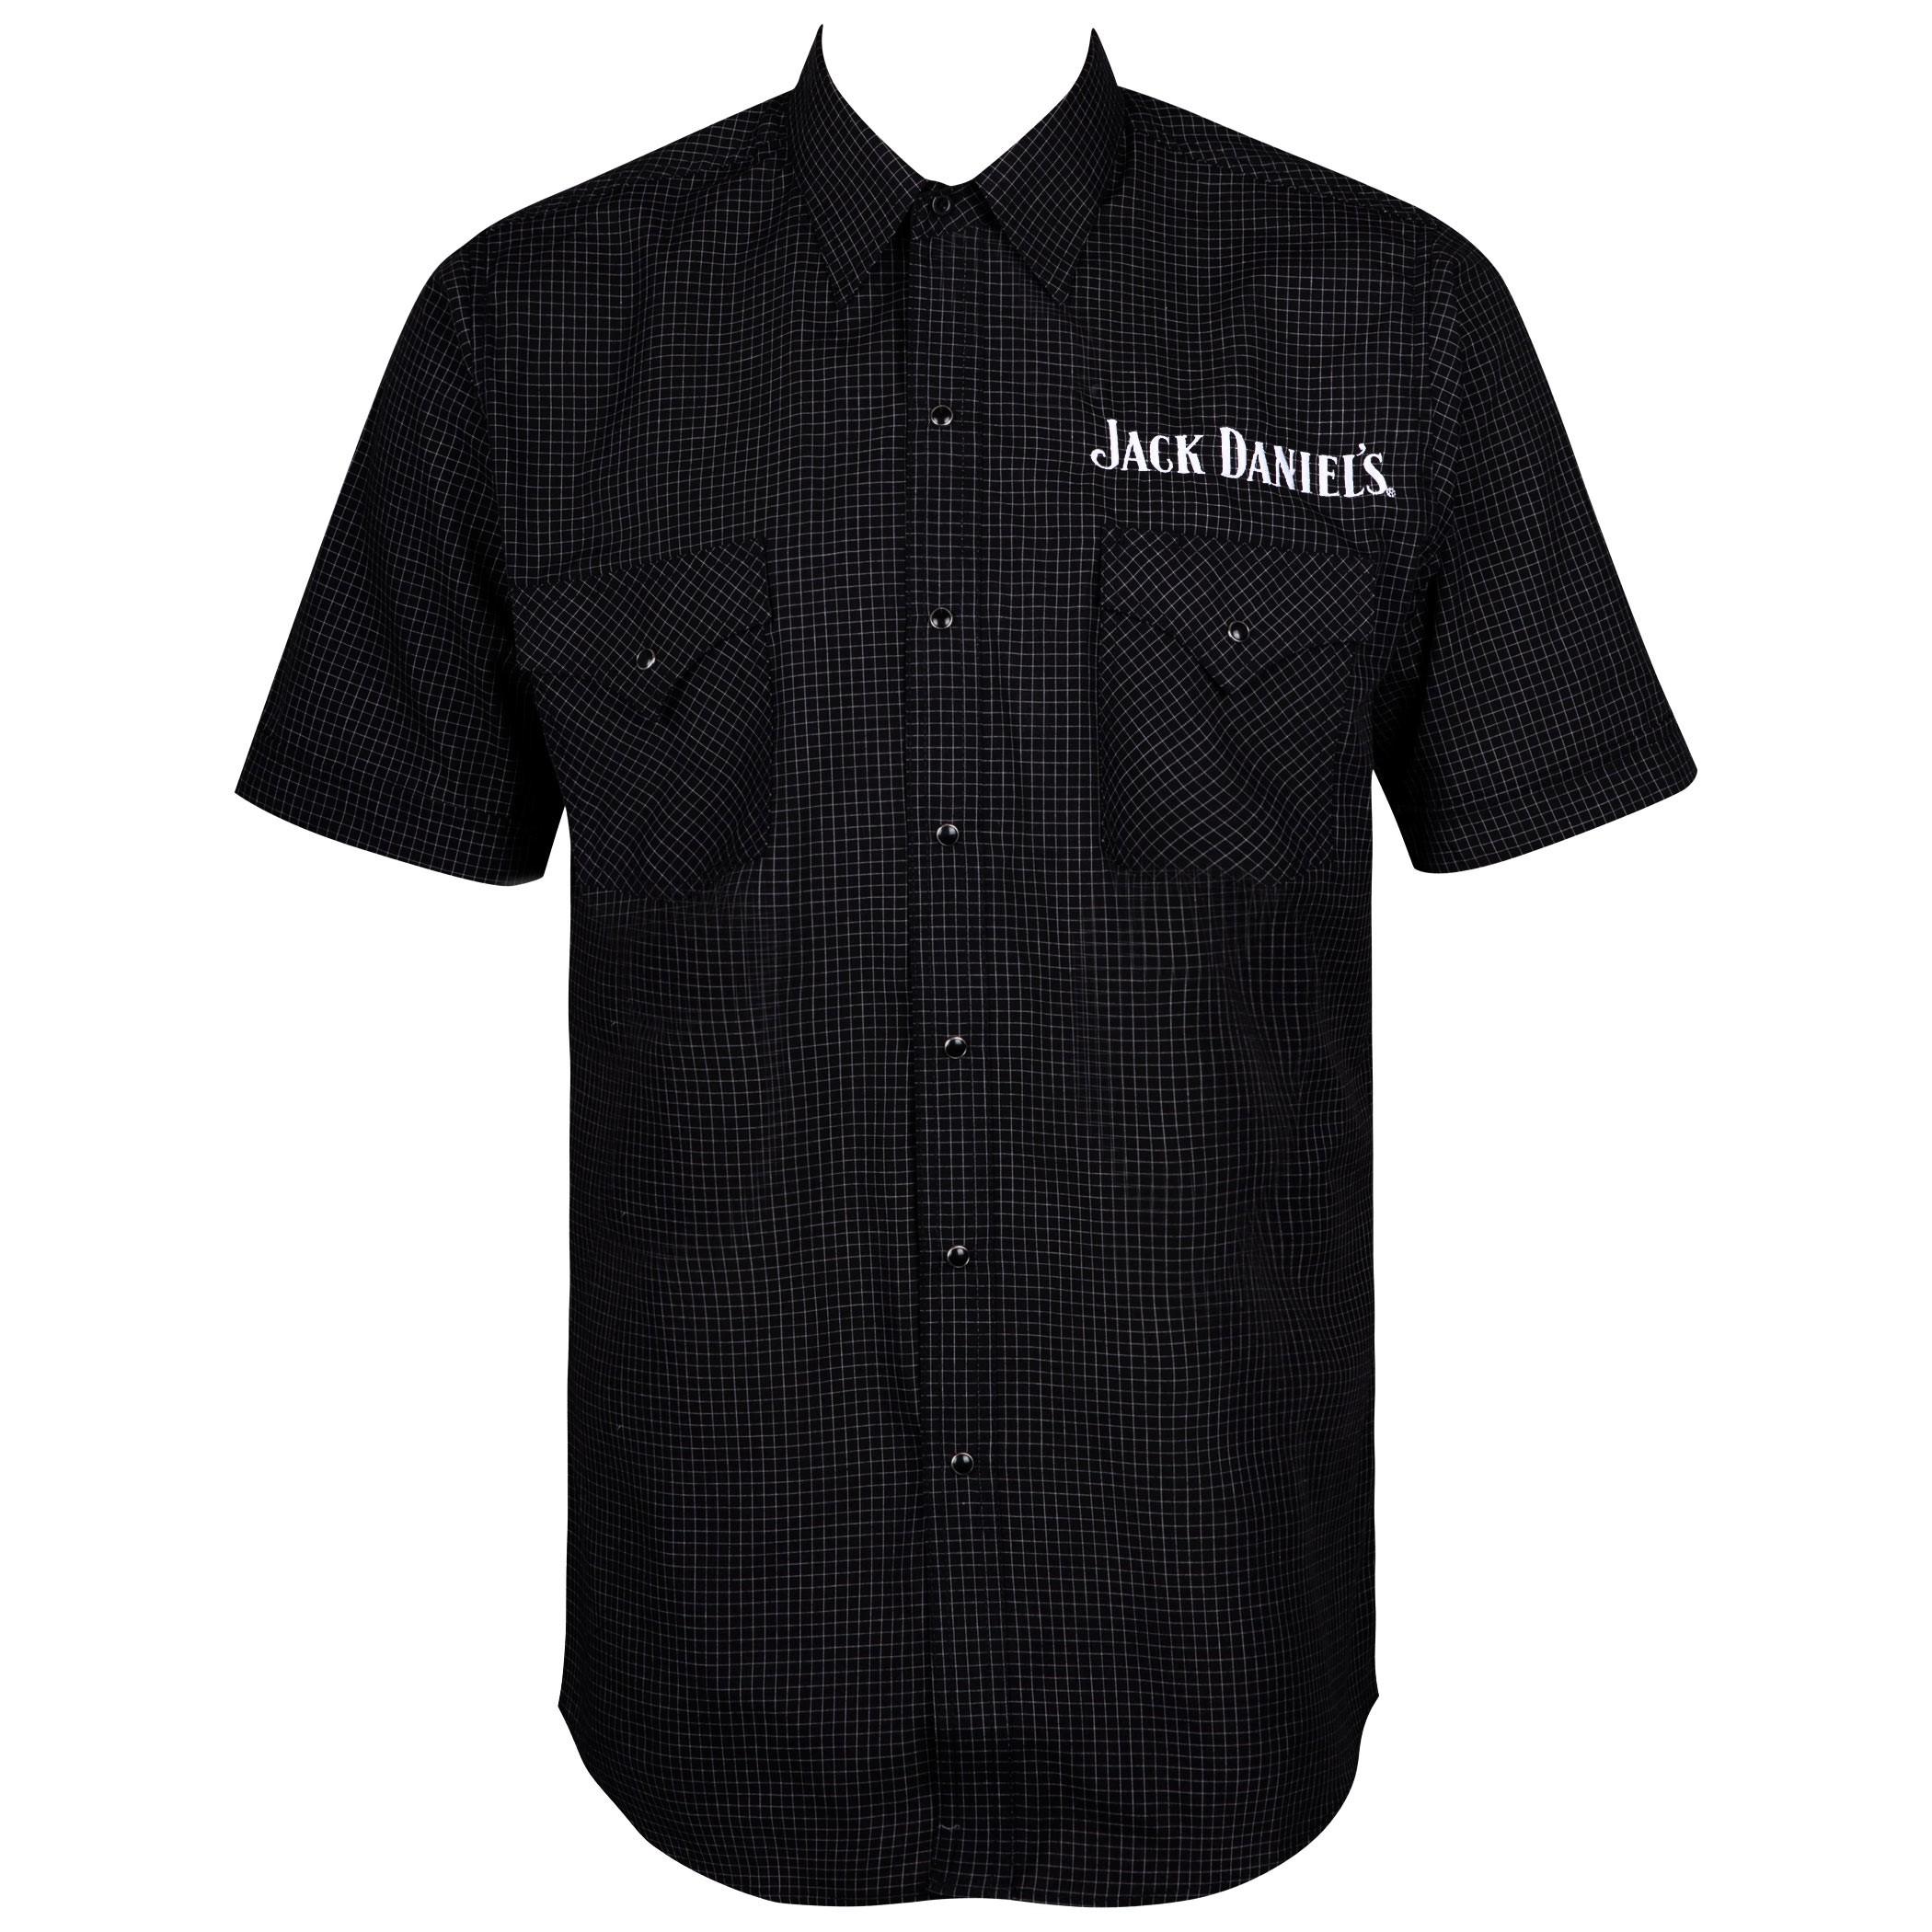 Jack Daniels Mini Checkered Short Sleeve Button Up Shirt